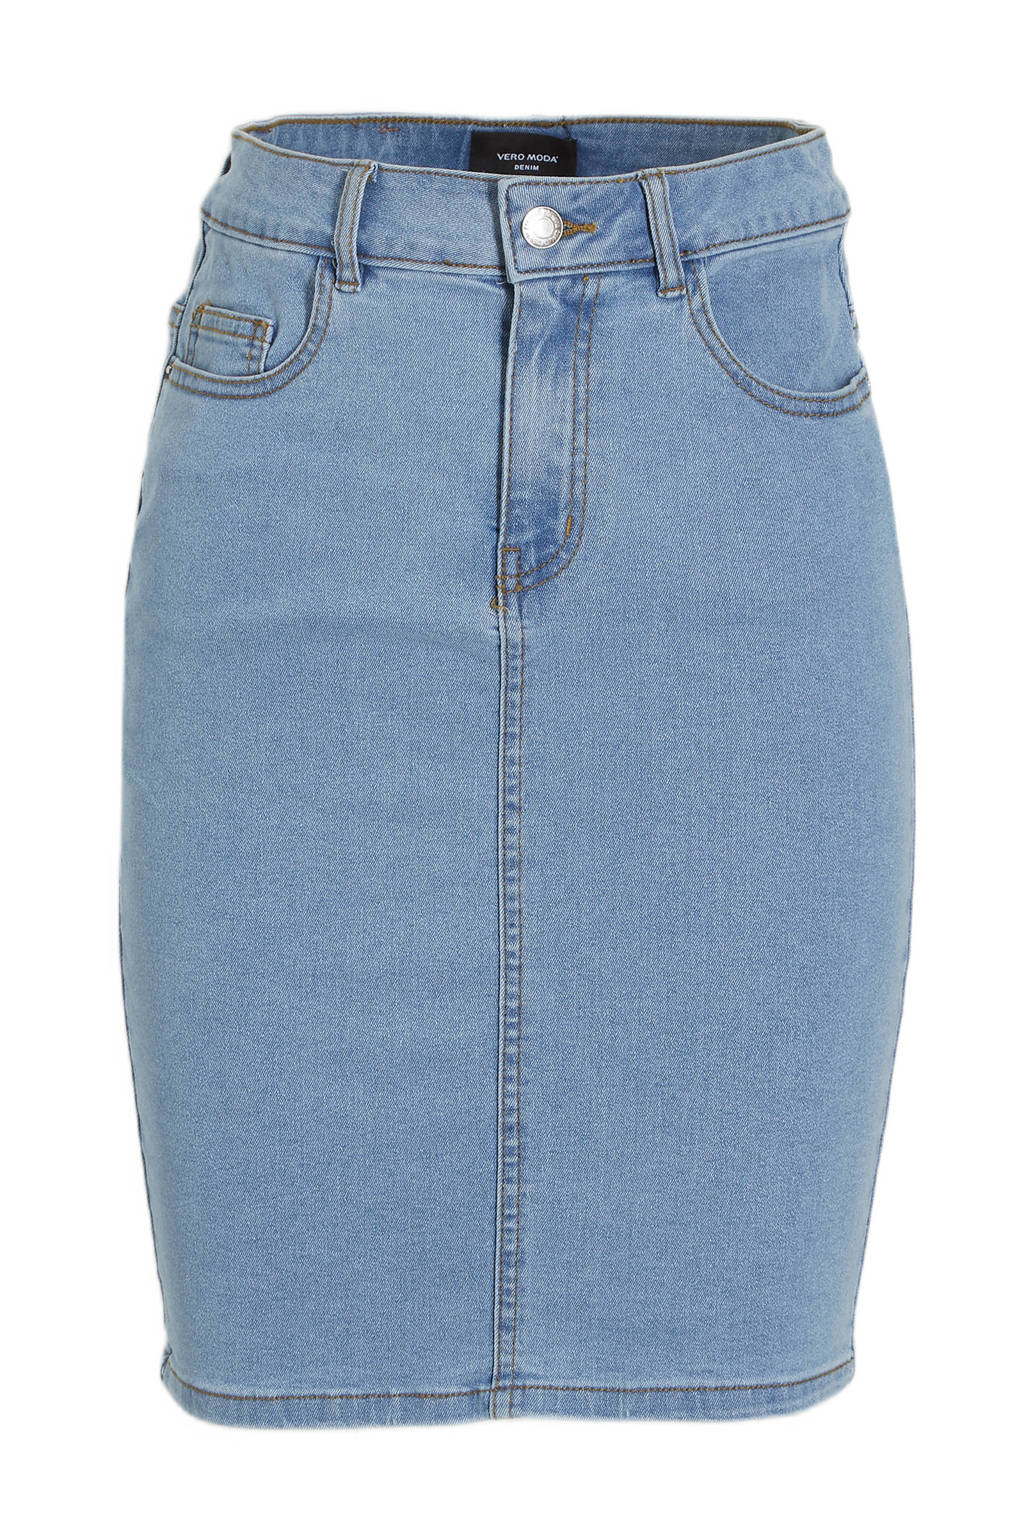 VERO MODA spijkerrok blauw, Blauw